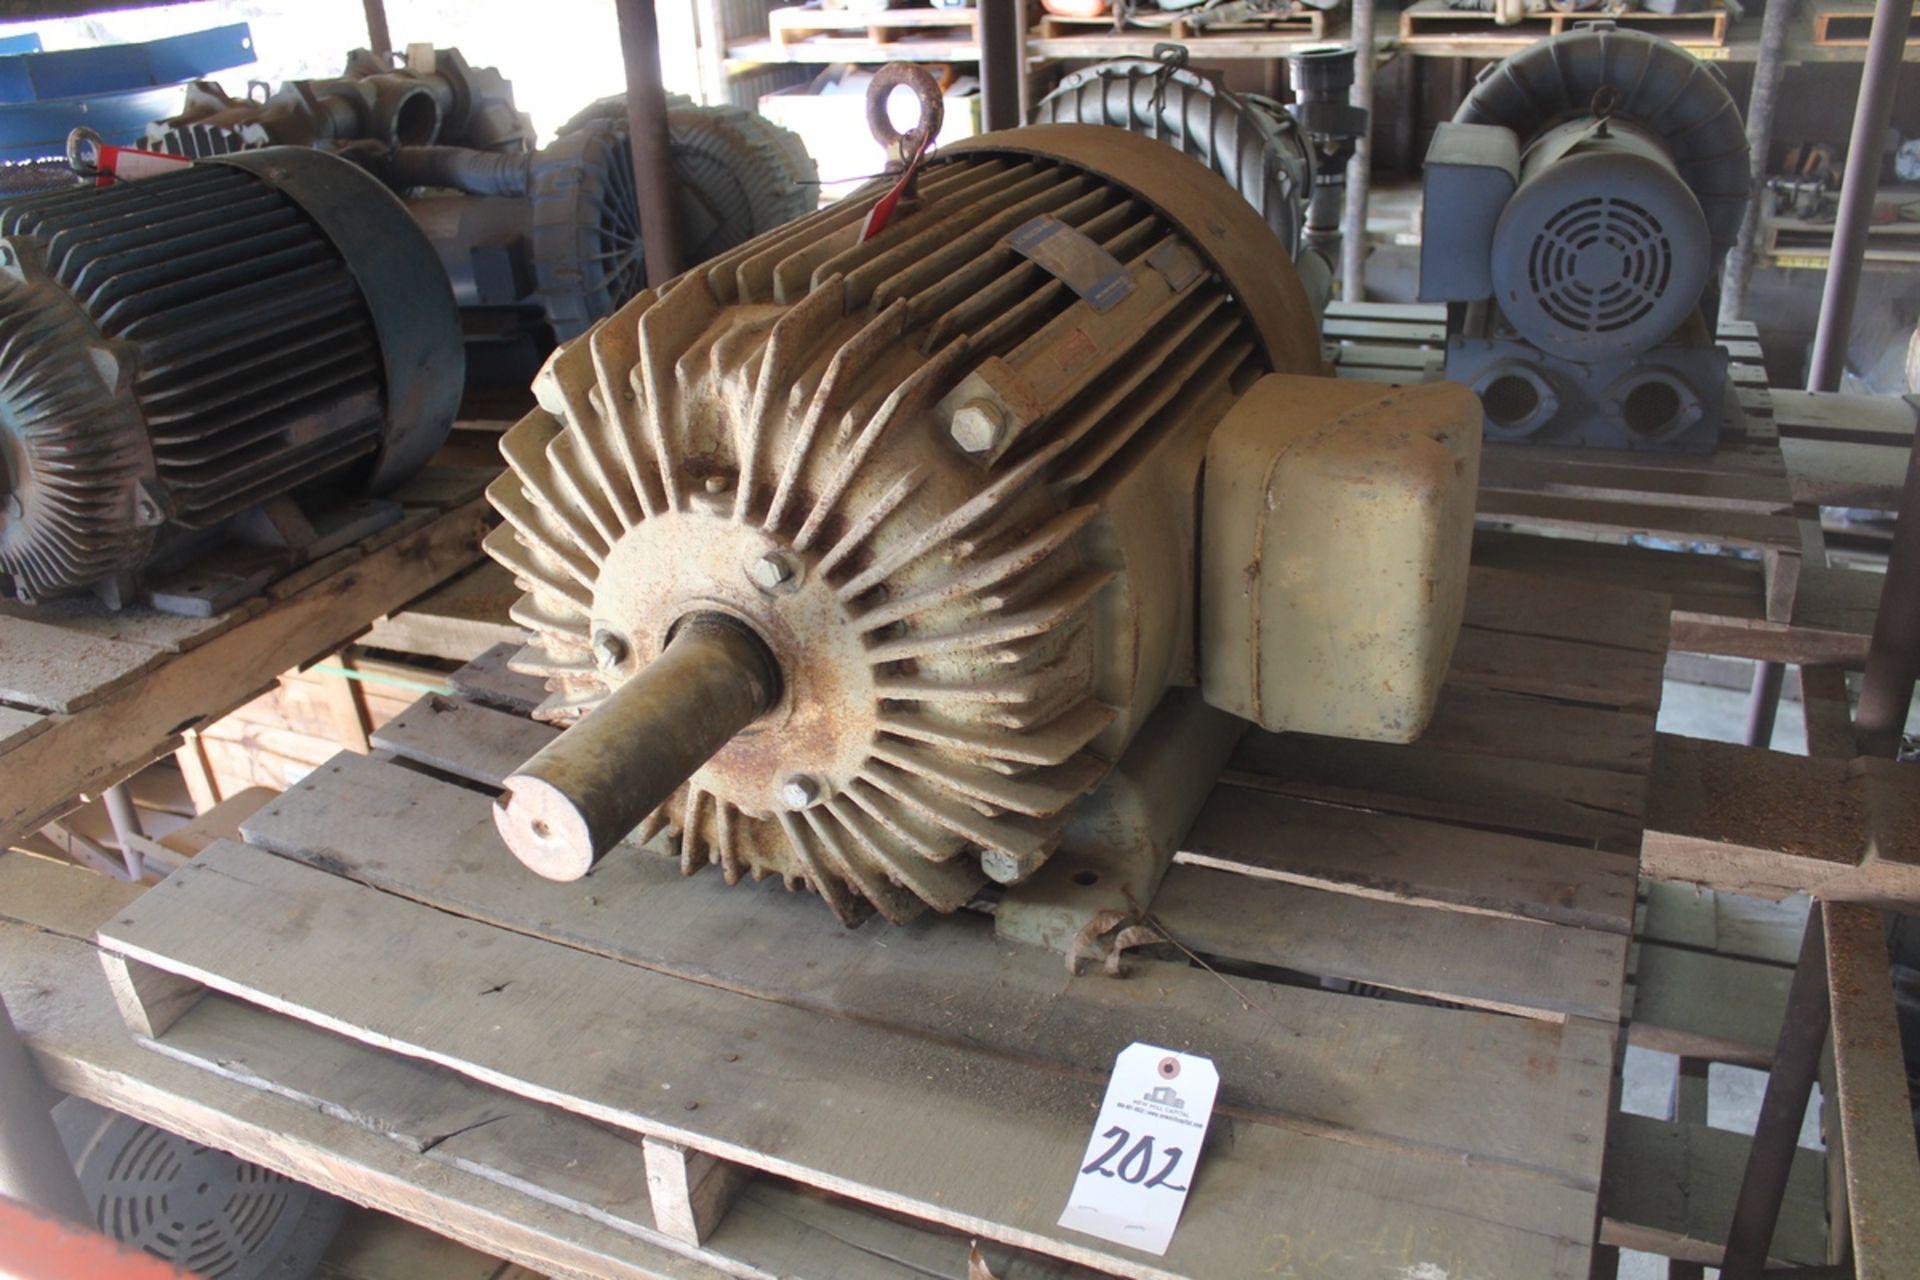 Lotto 202 - Louis-Allis Motor 50 hp 1800 rpm 405T 230/460V TEFC | Load Fee: $5